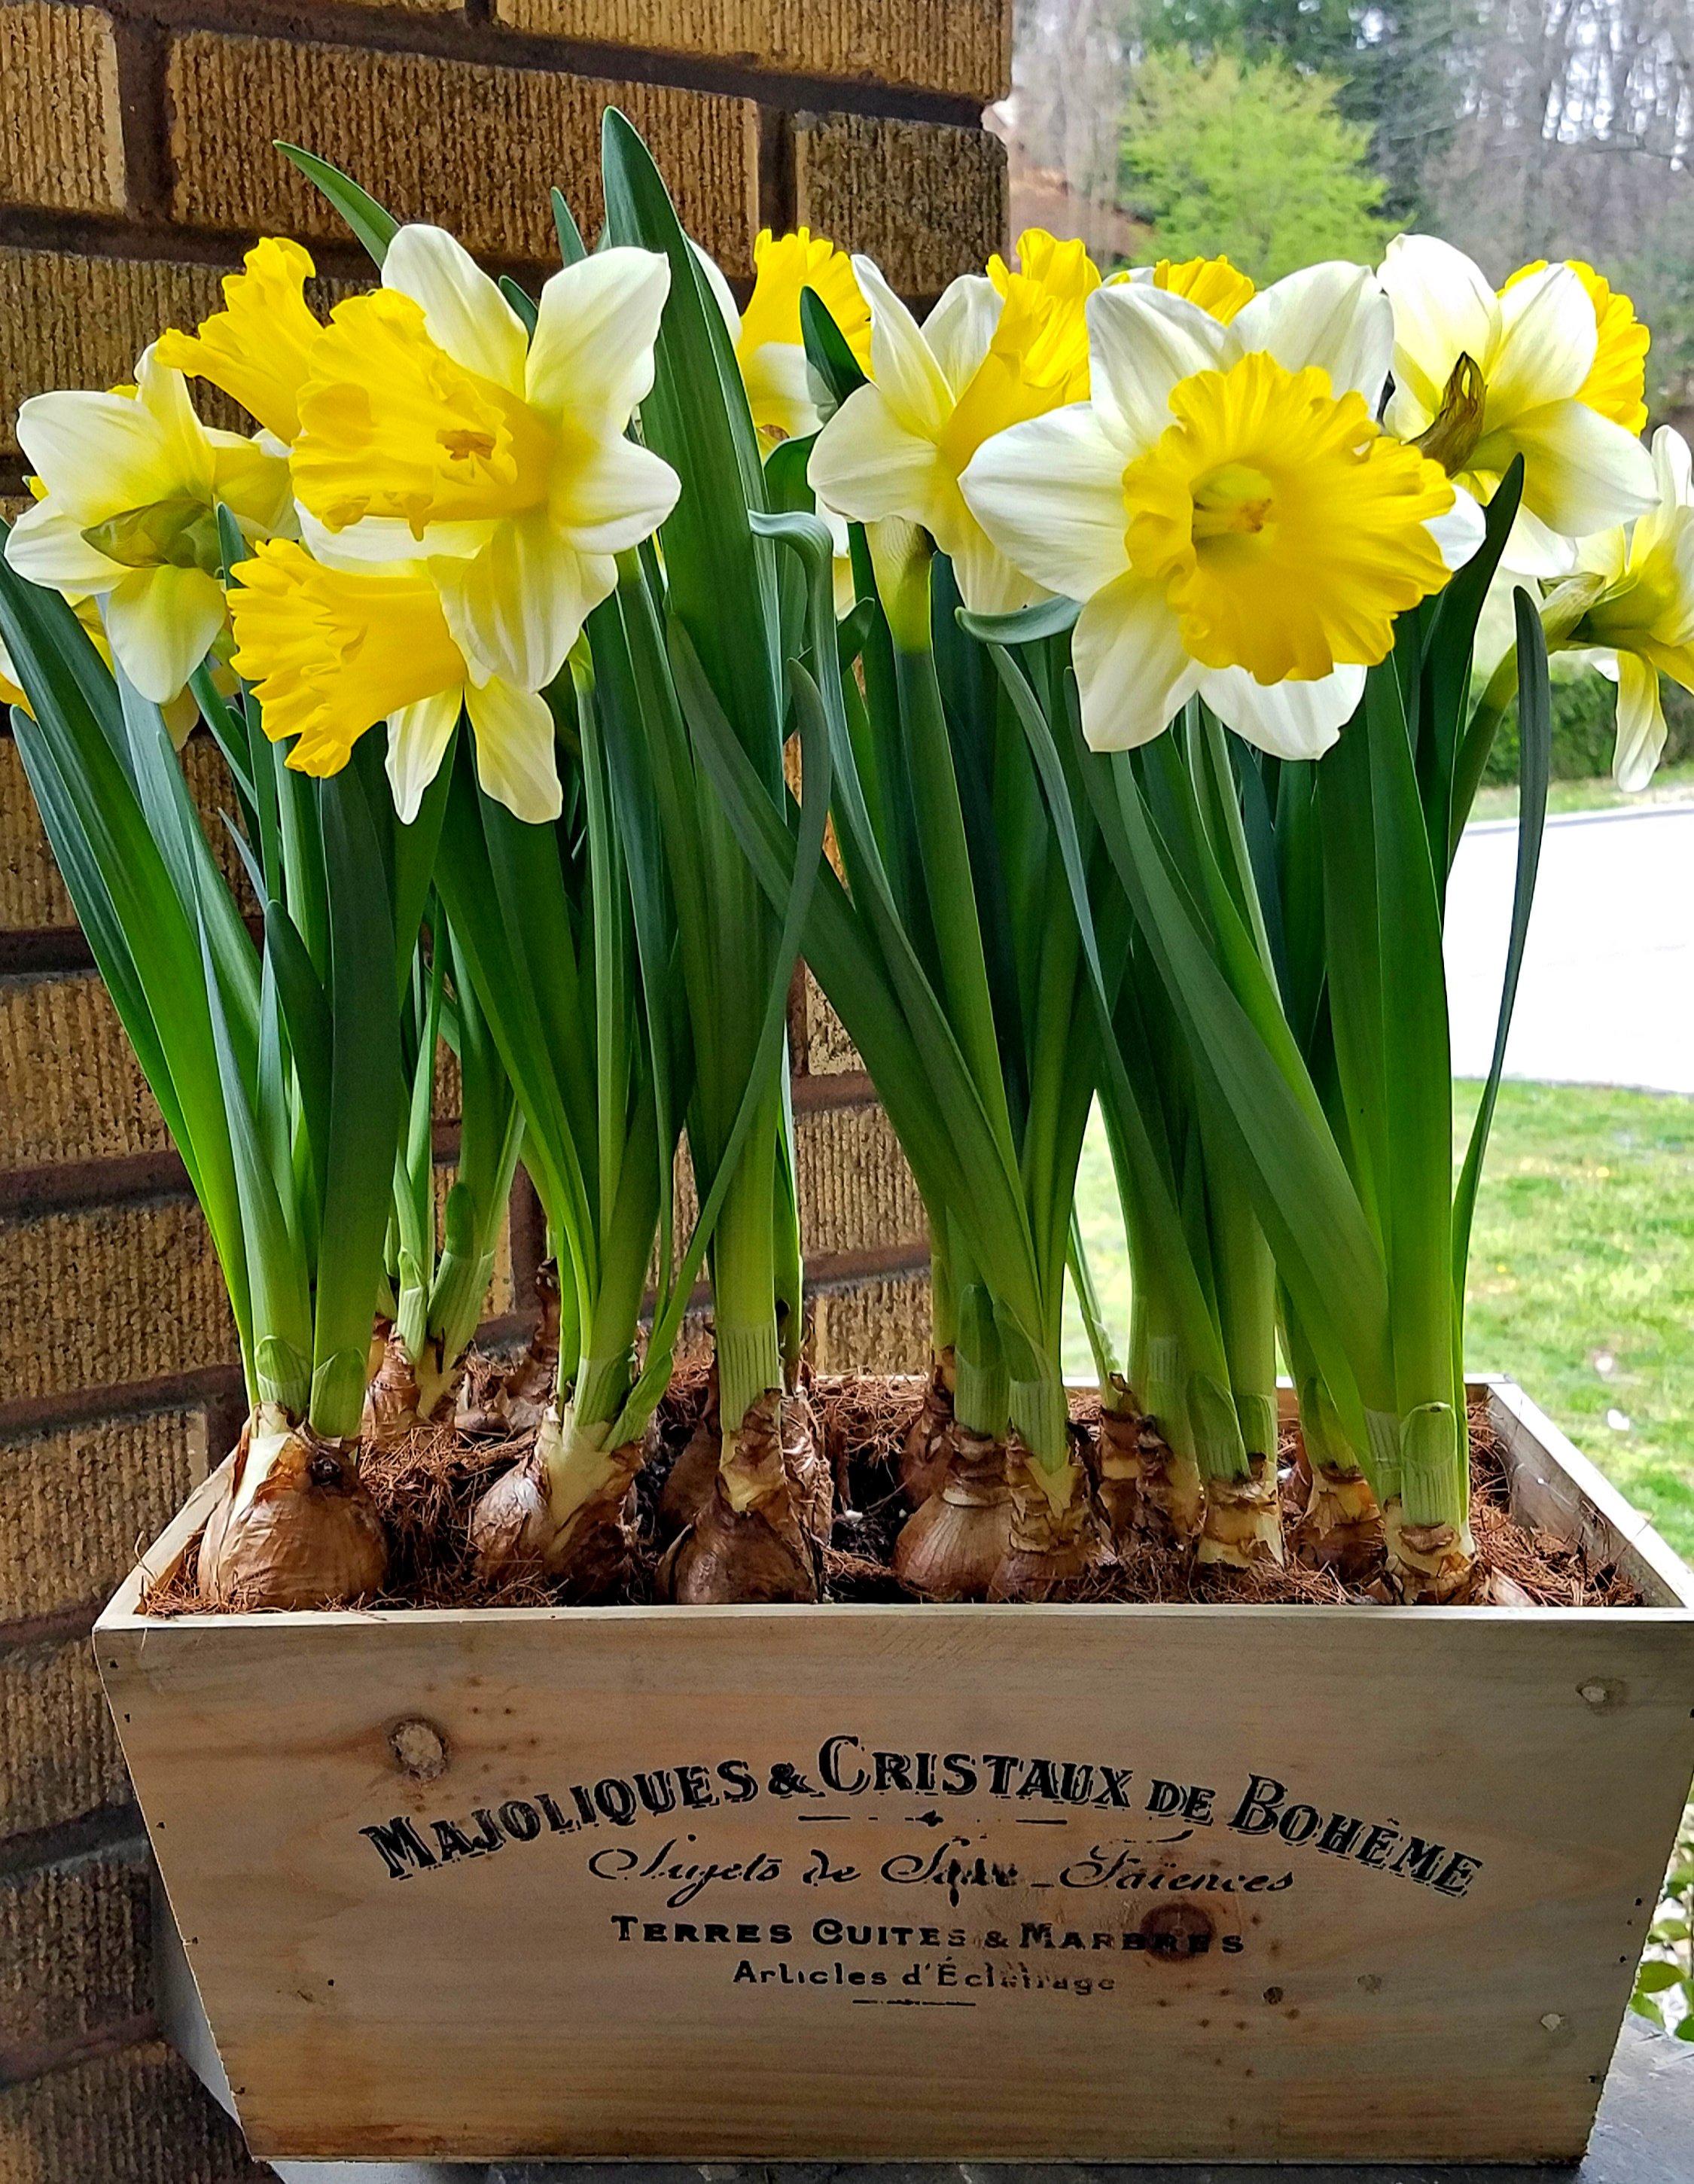 Beutiful Daffodil bulbs in French wooden box